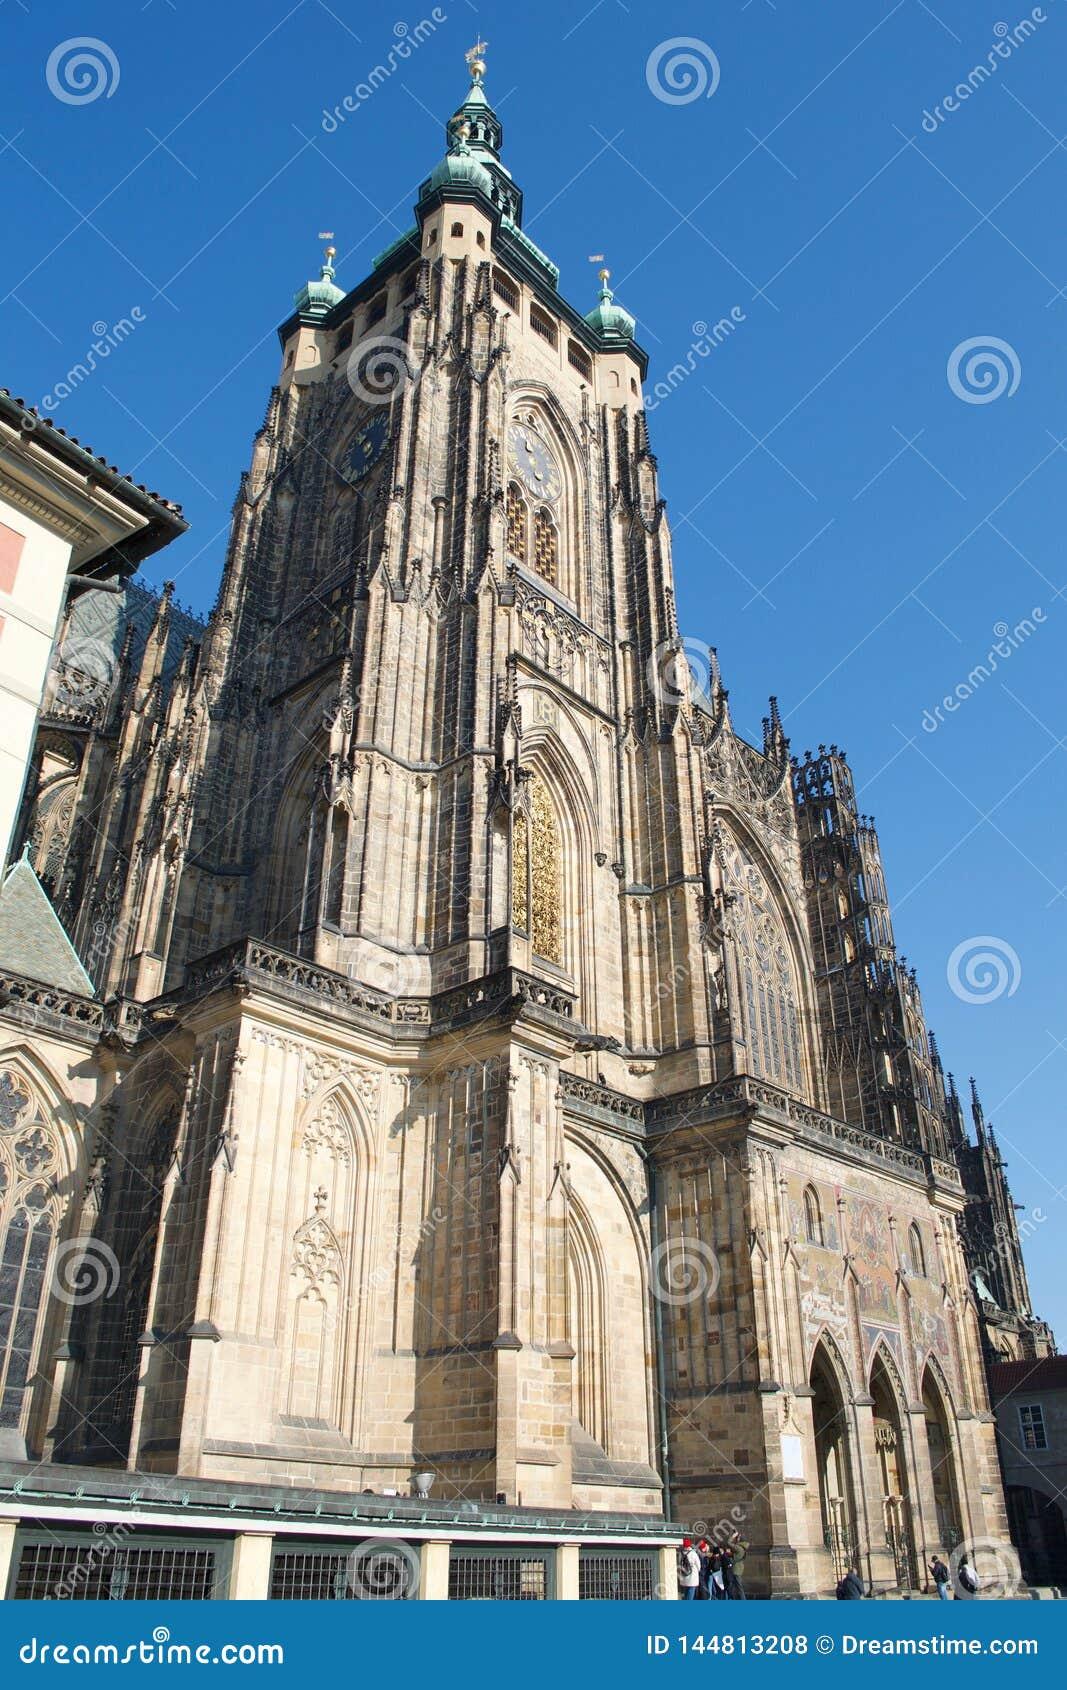 St维塔斯大教堂布拉格城堡南塔